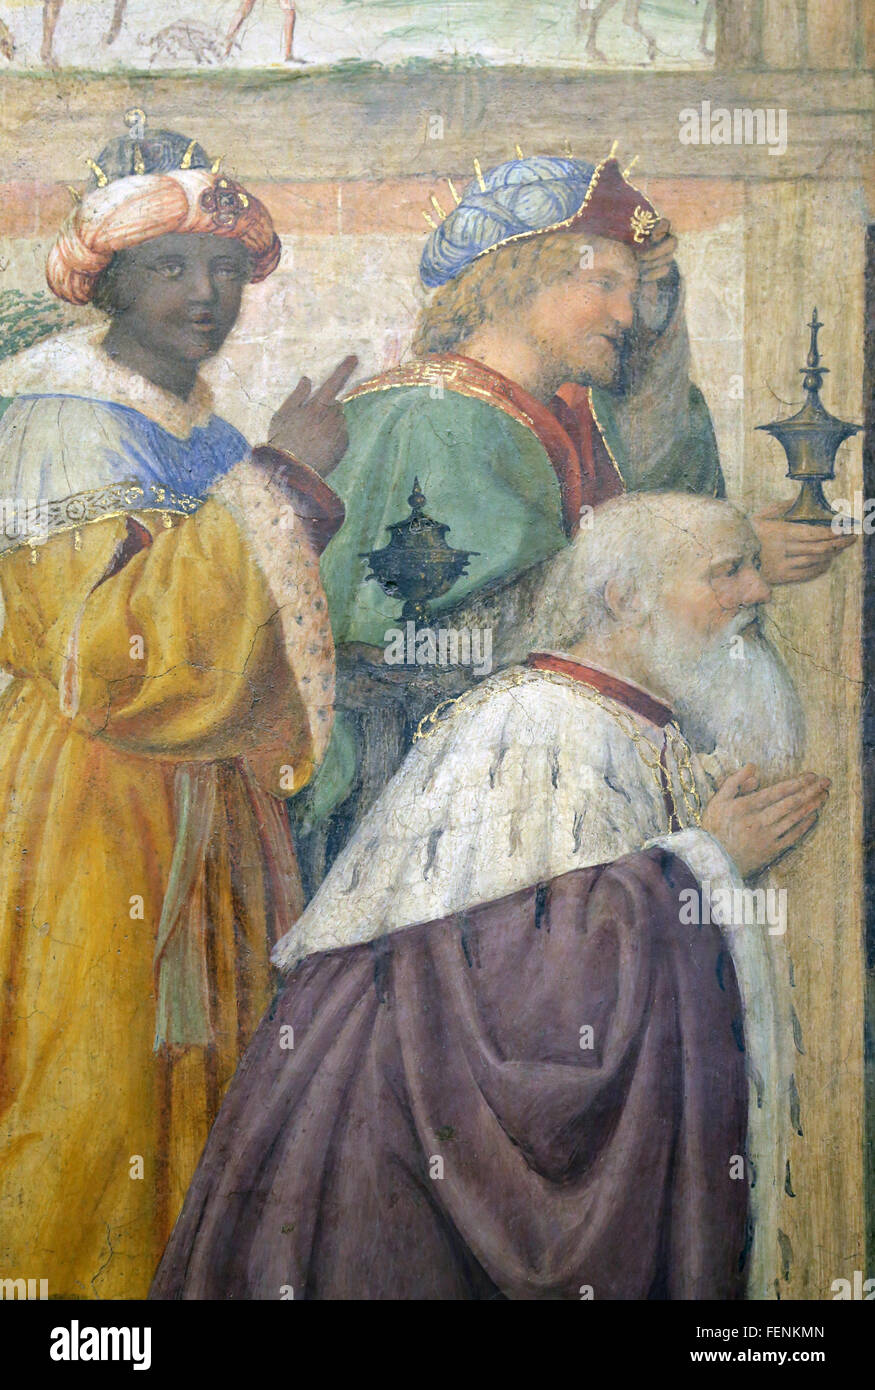 Adoration of the Magi, 1520-1525. By Italian painter Bernardino Luini (1480-1532). Detail. Fresco. - Stock Image